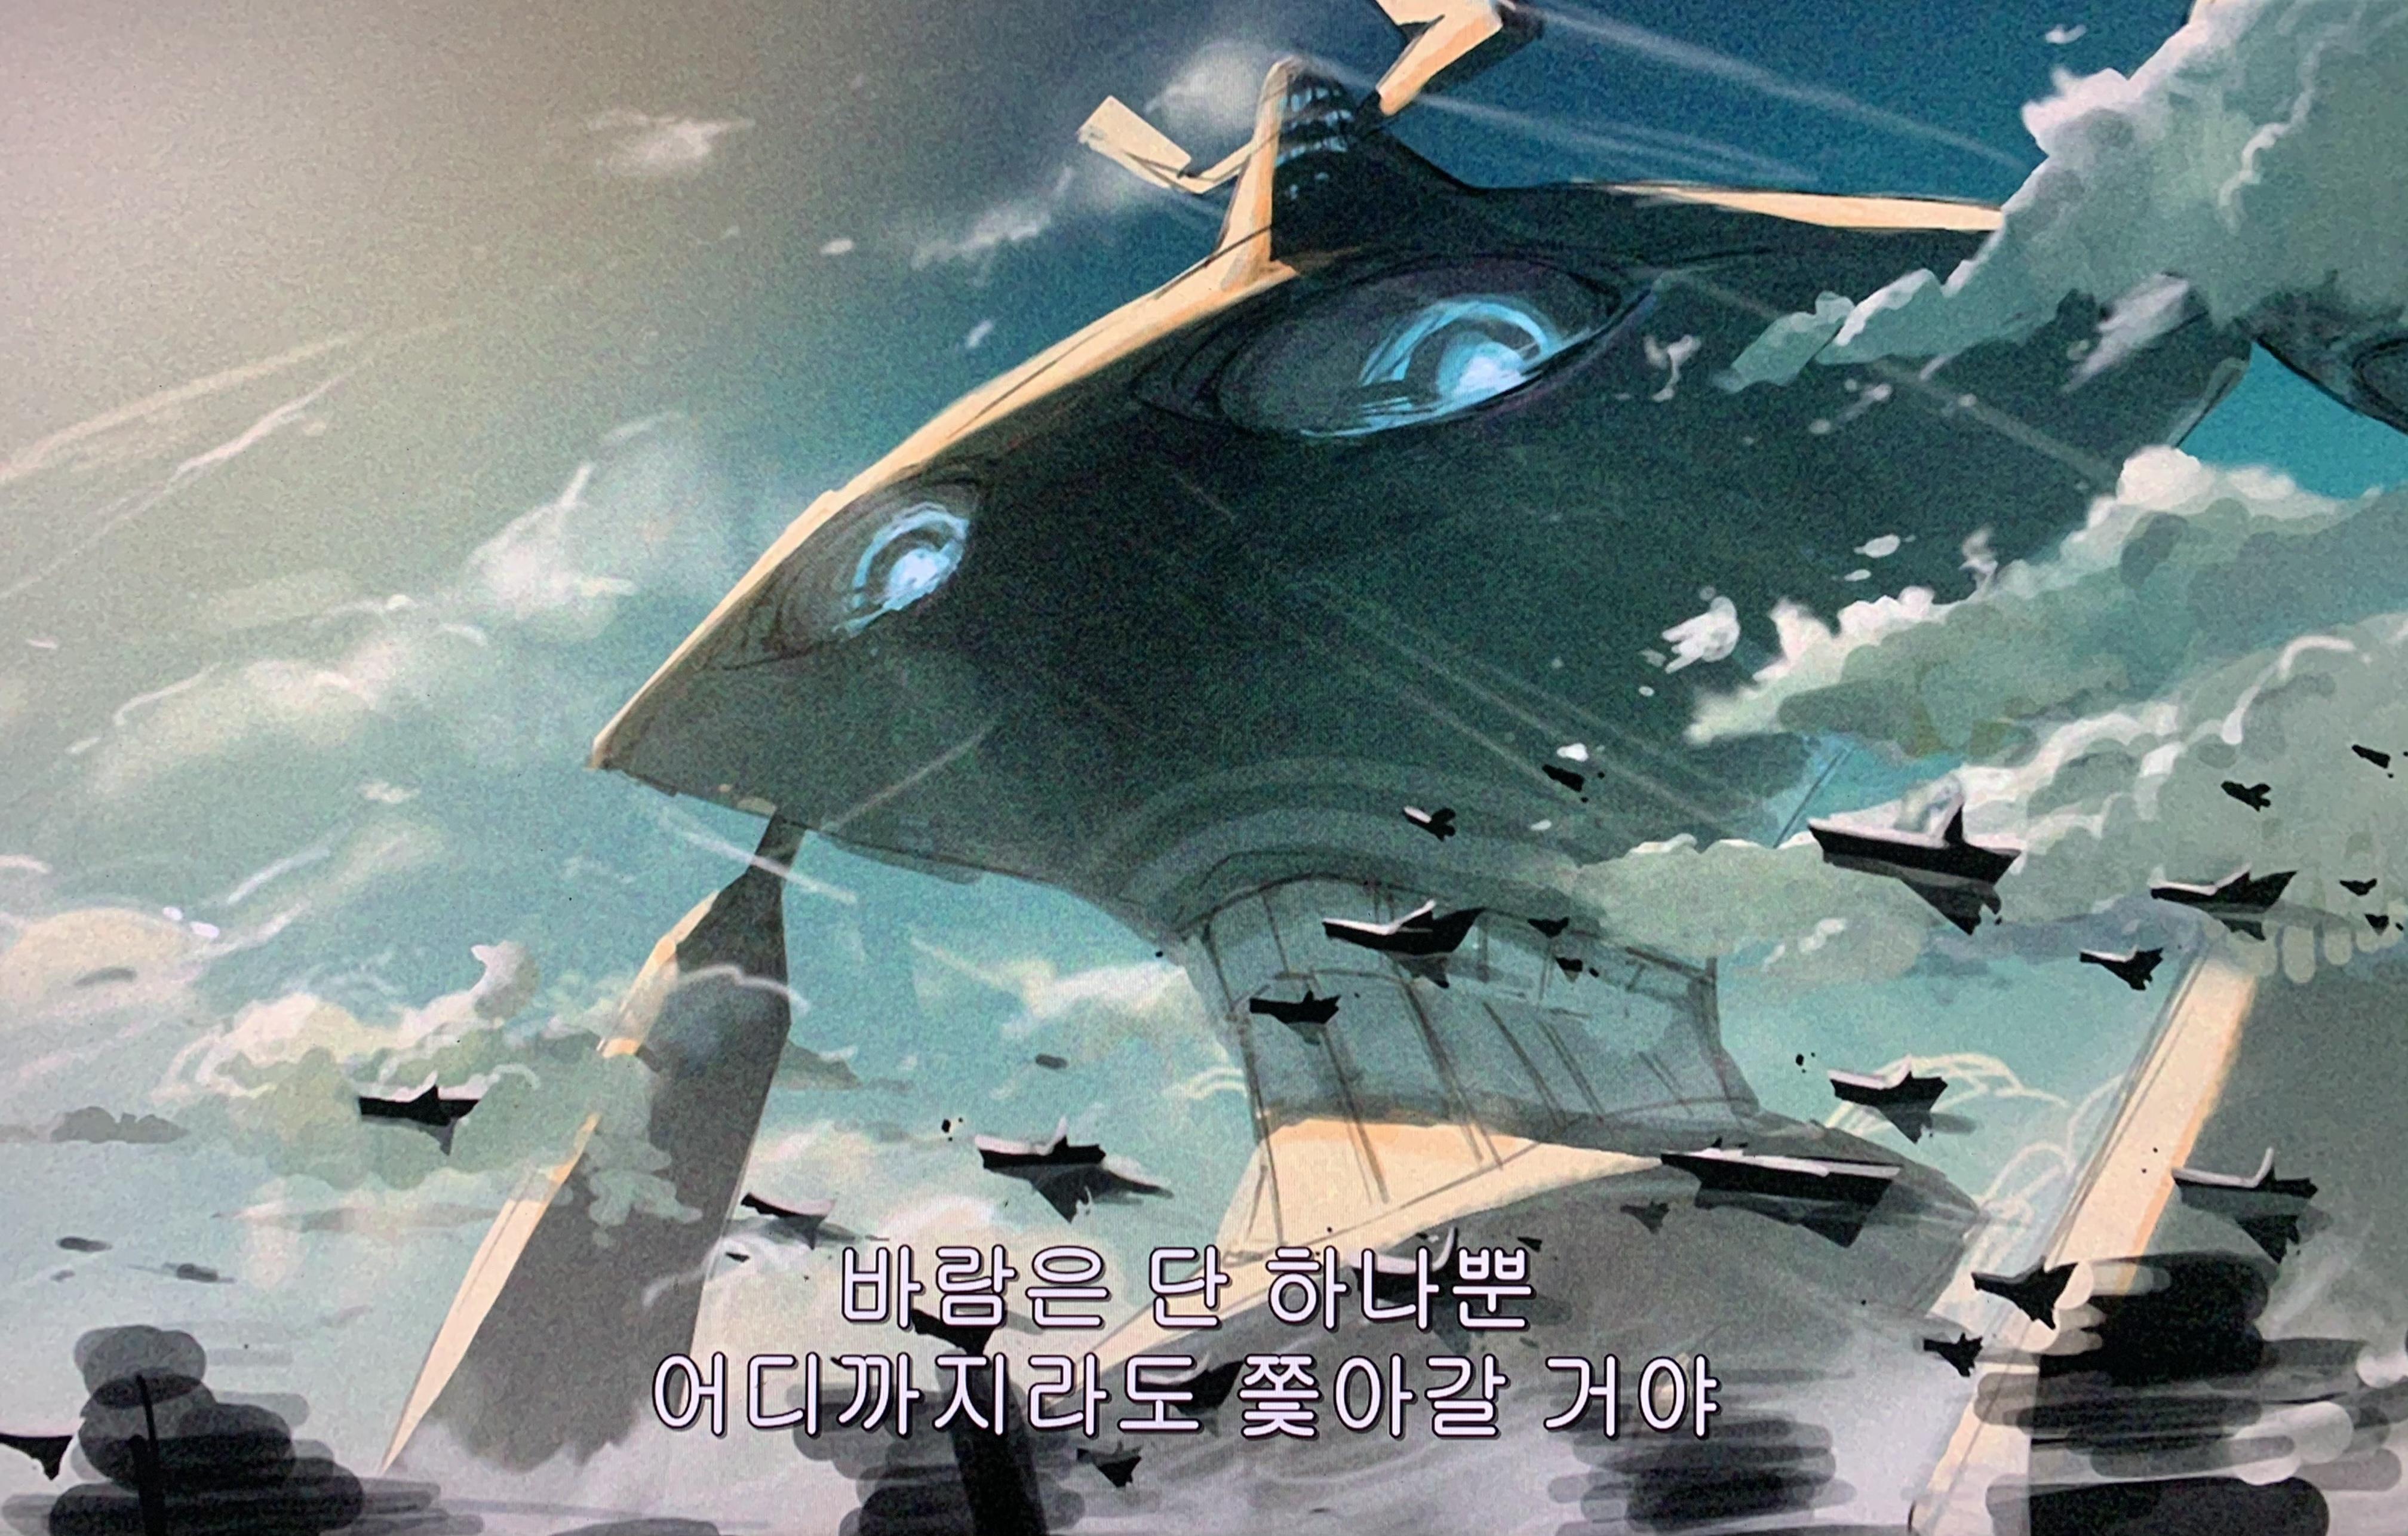 73639647-A3AF-4815-99CC-18F2602E7DA7.jpeg